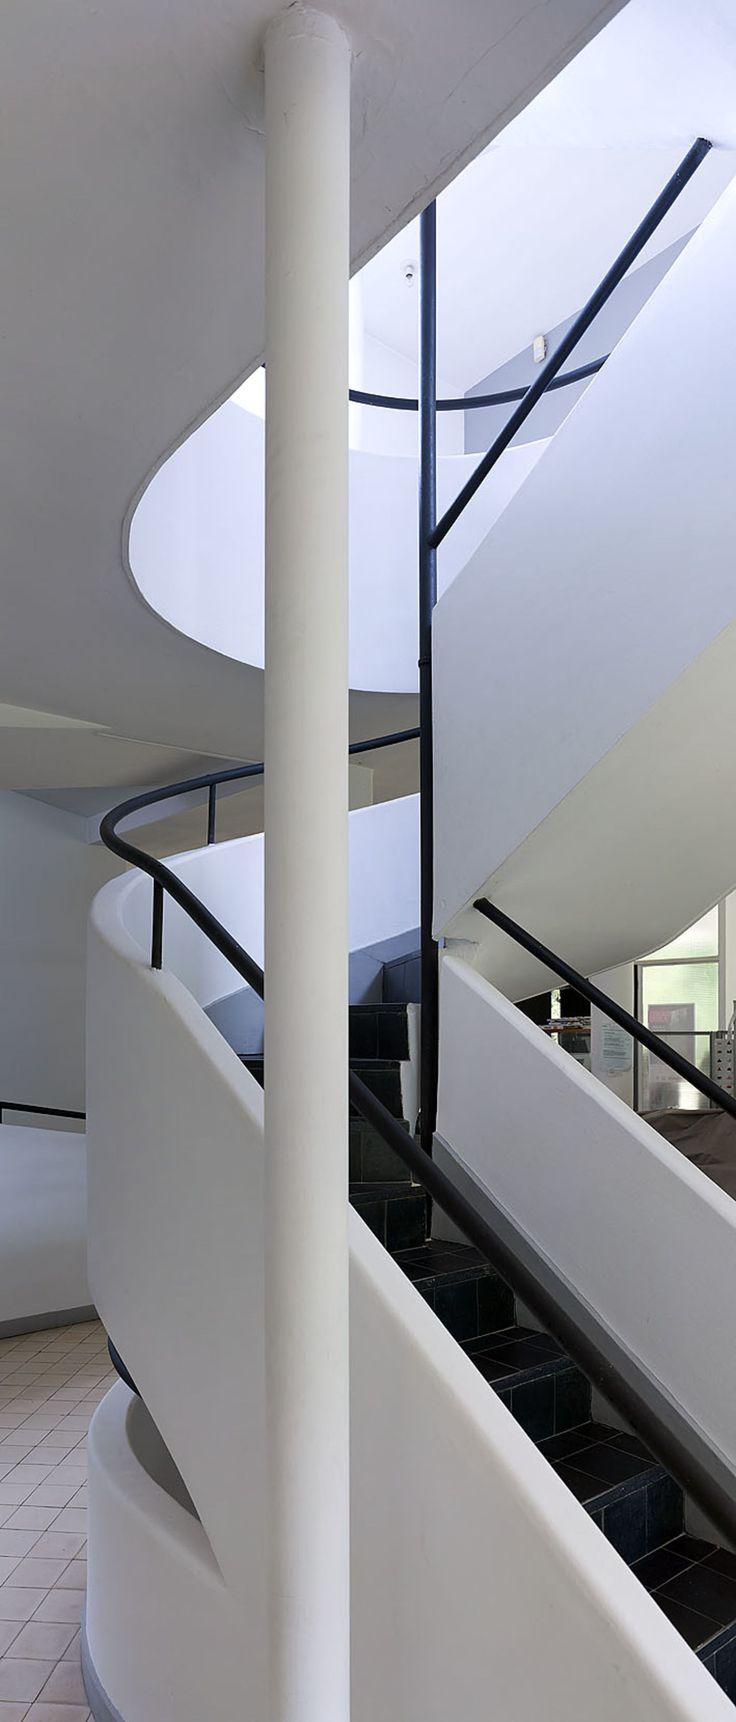 Le corbusier cemal emden · villa savoye · divisare